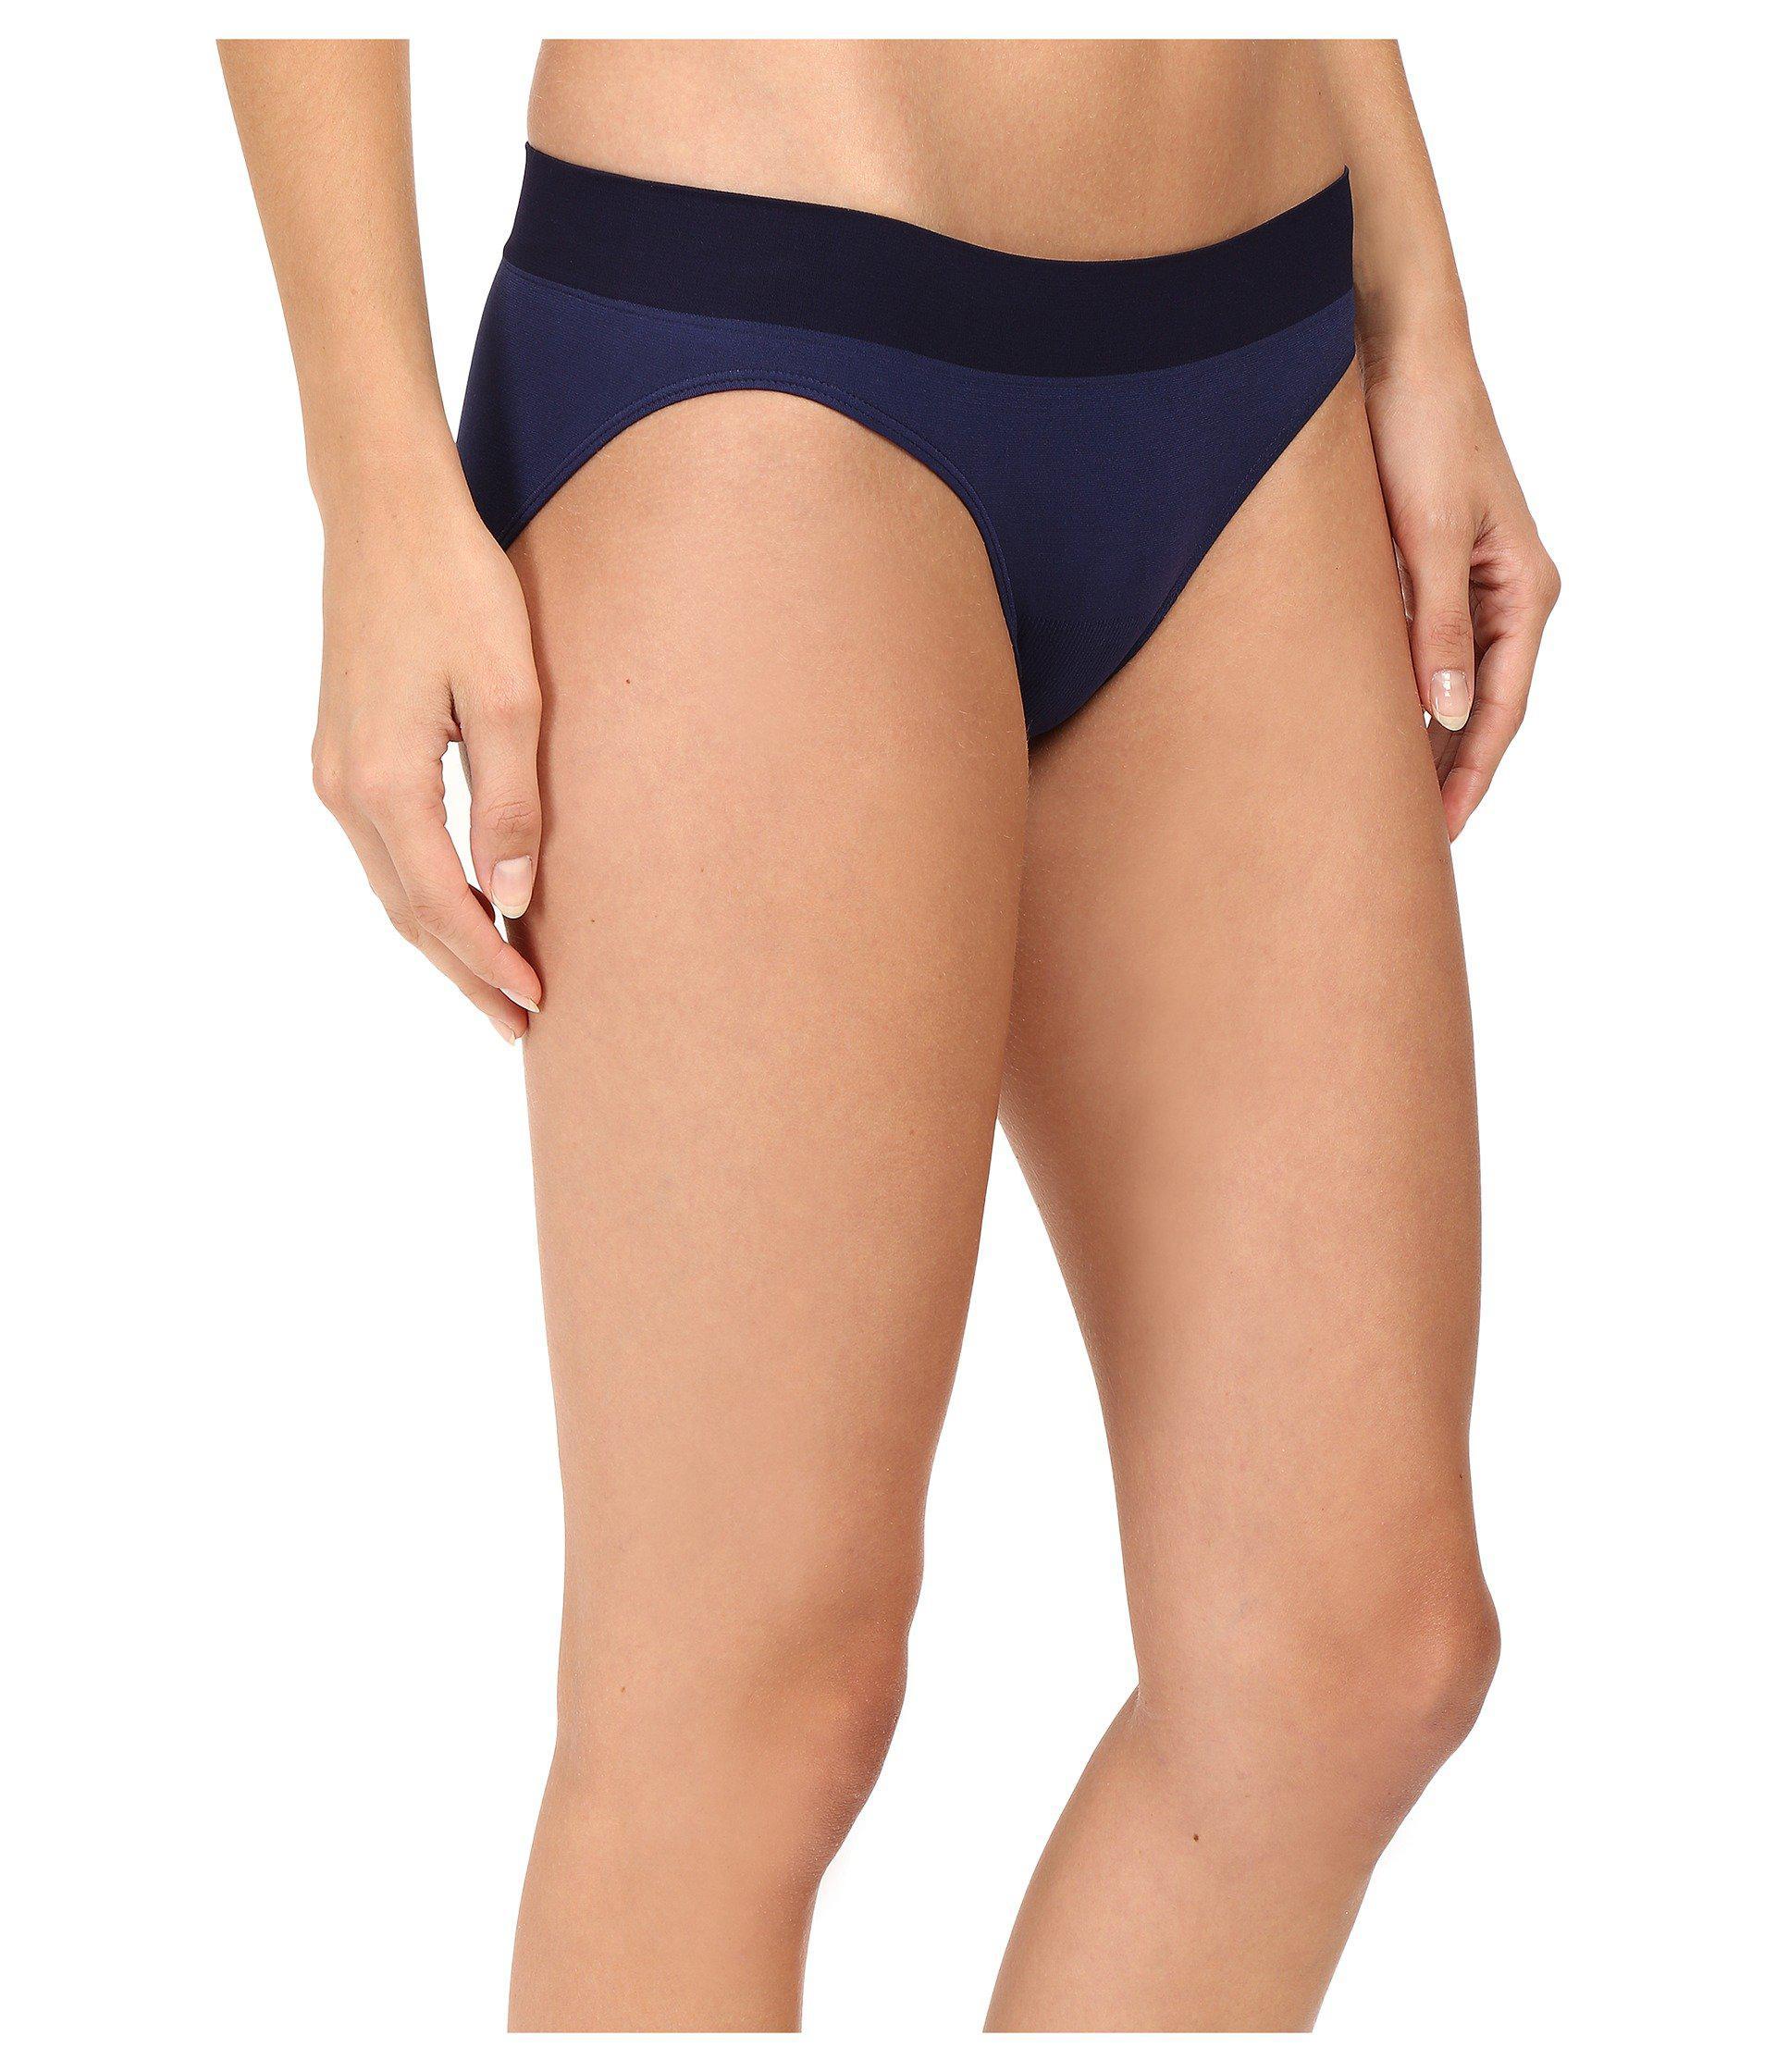 0a11ab11be7c2 Jockey - Blue Modern Micro Bikini (black) Women s Underwear - Lyst. View  fullscreen